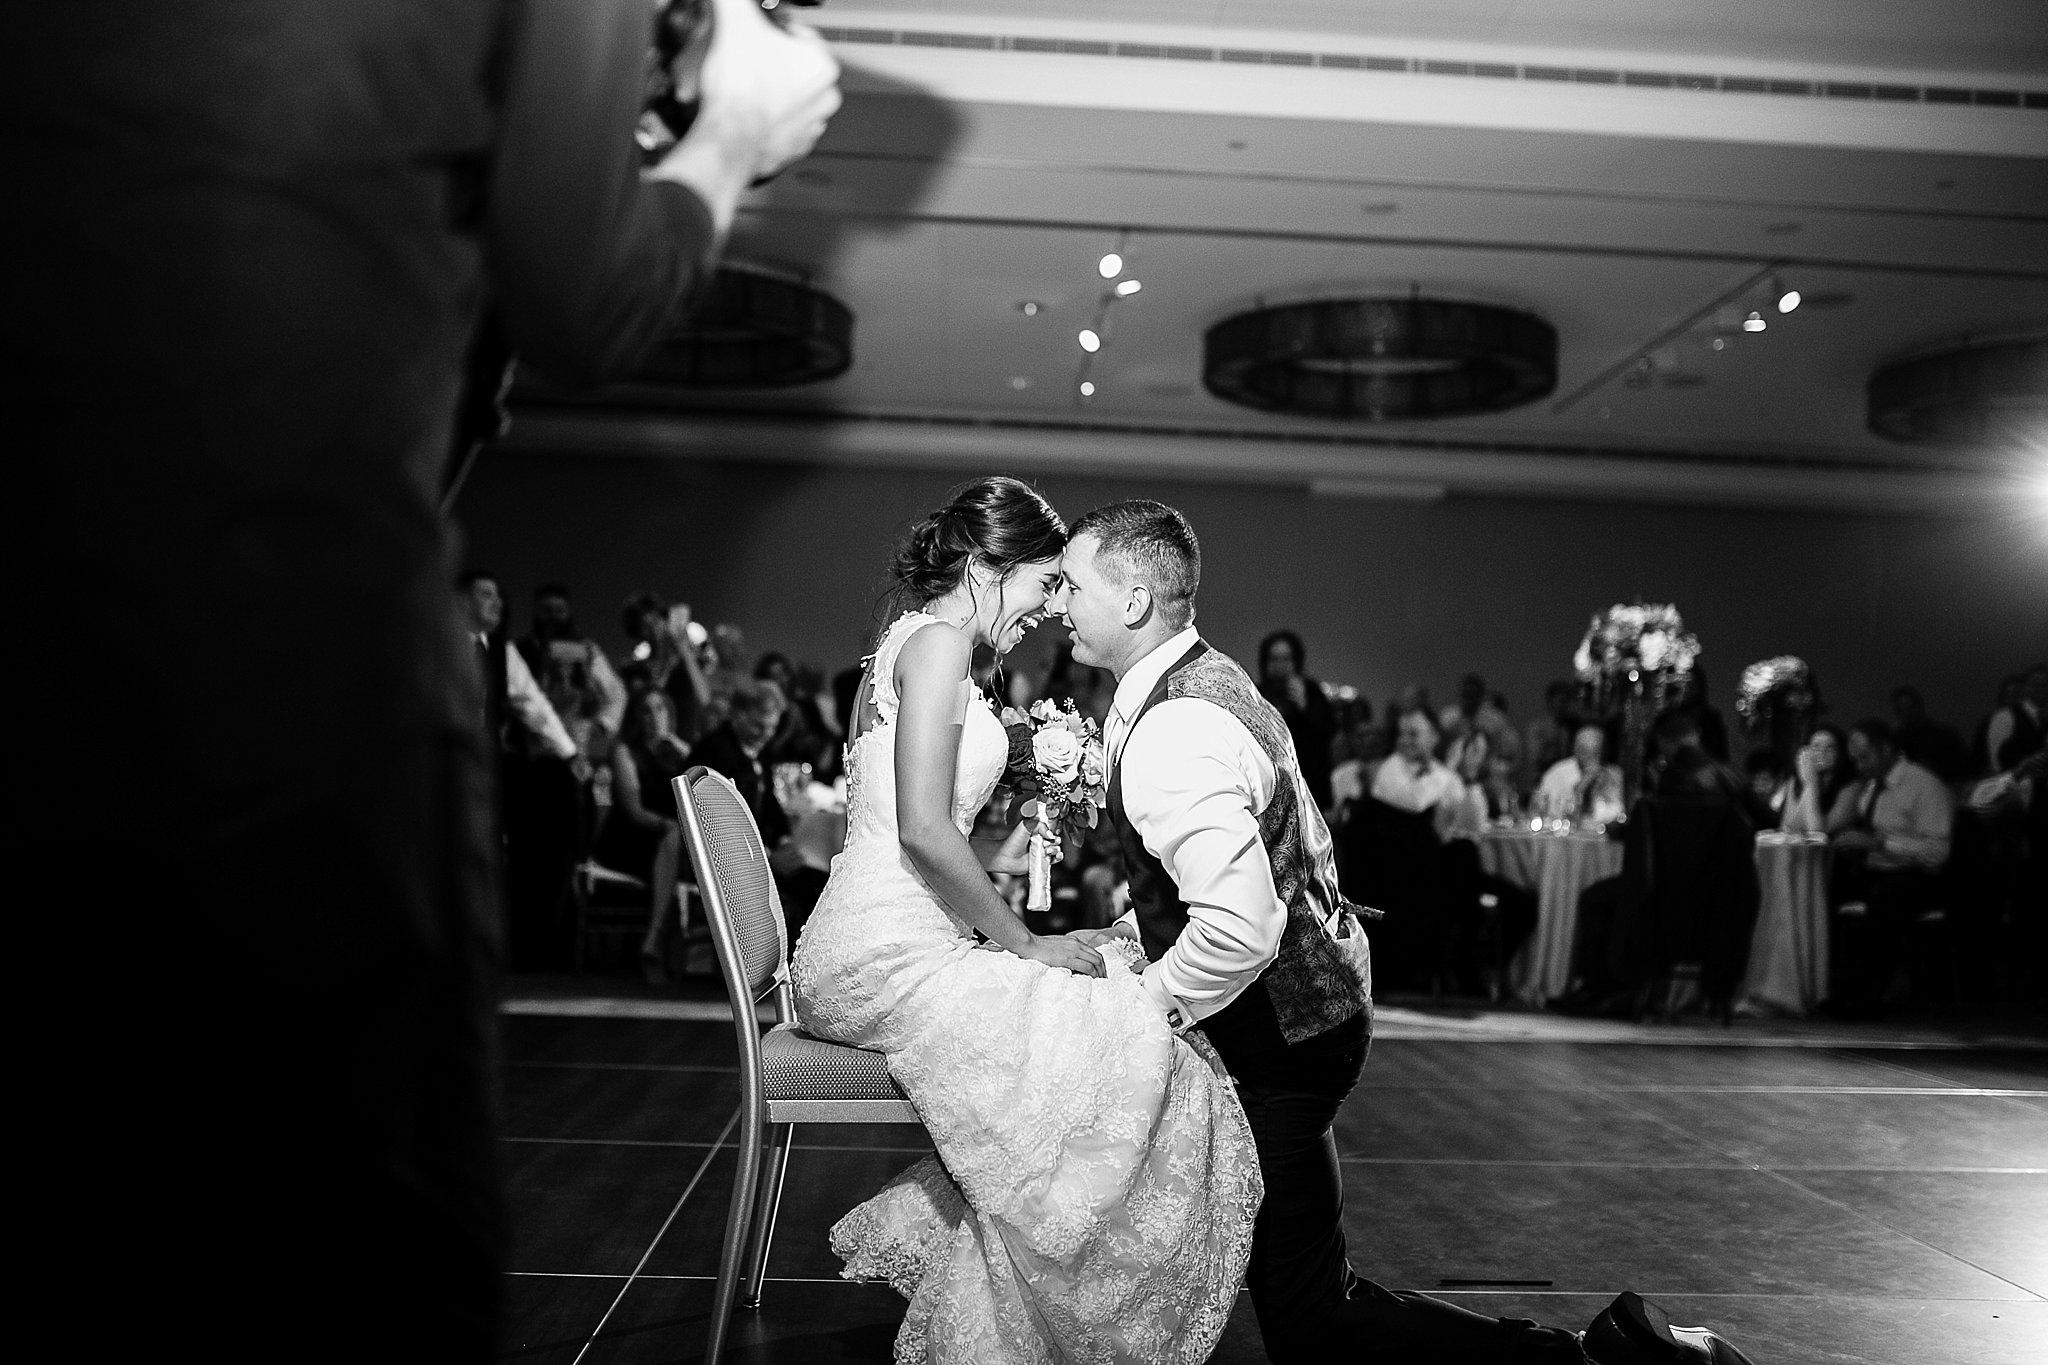 Seaport Hotel Wedding Boston Photographer Sweet Alice72.jpg